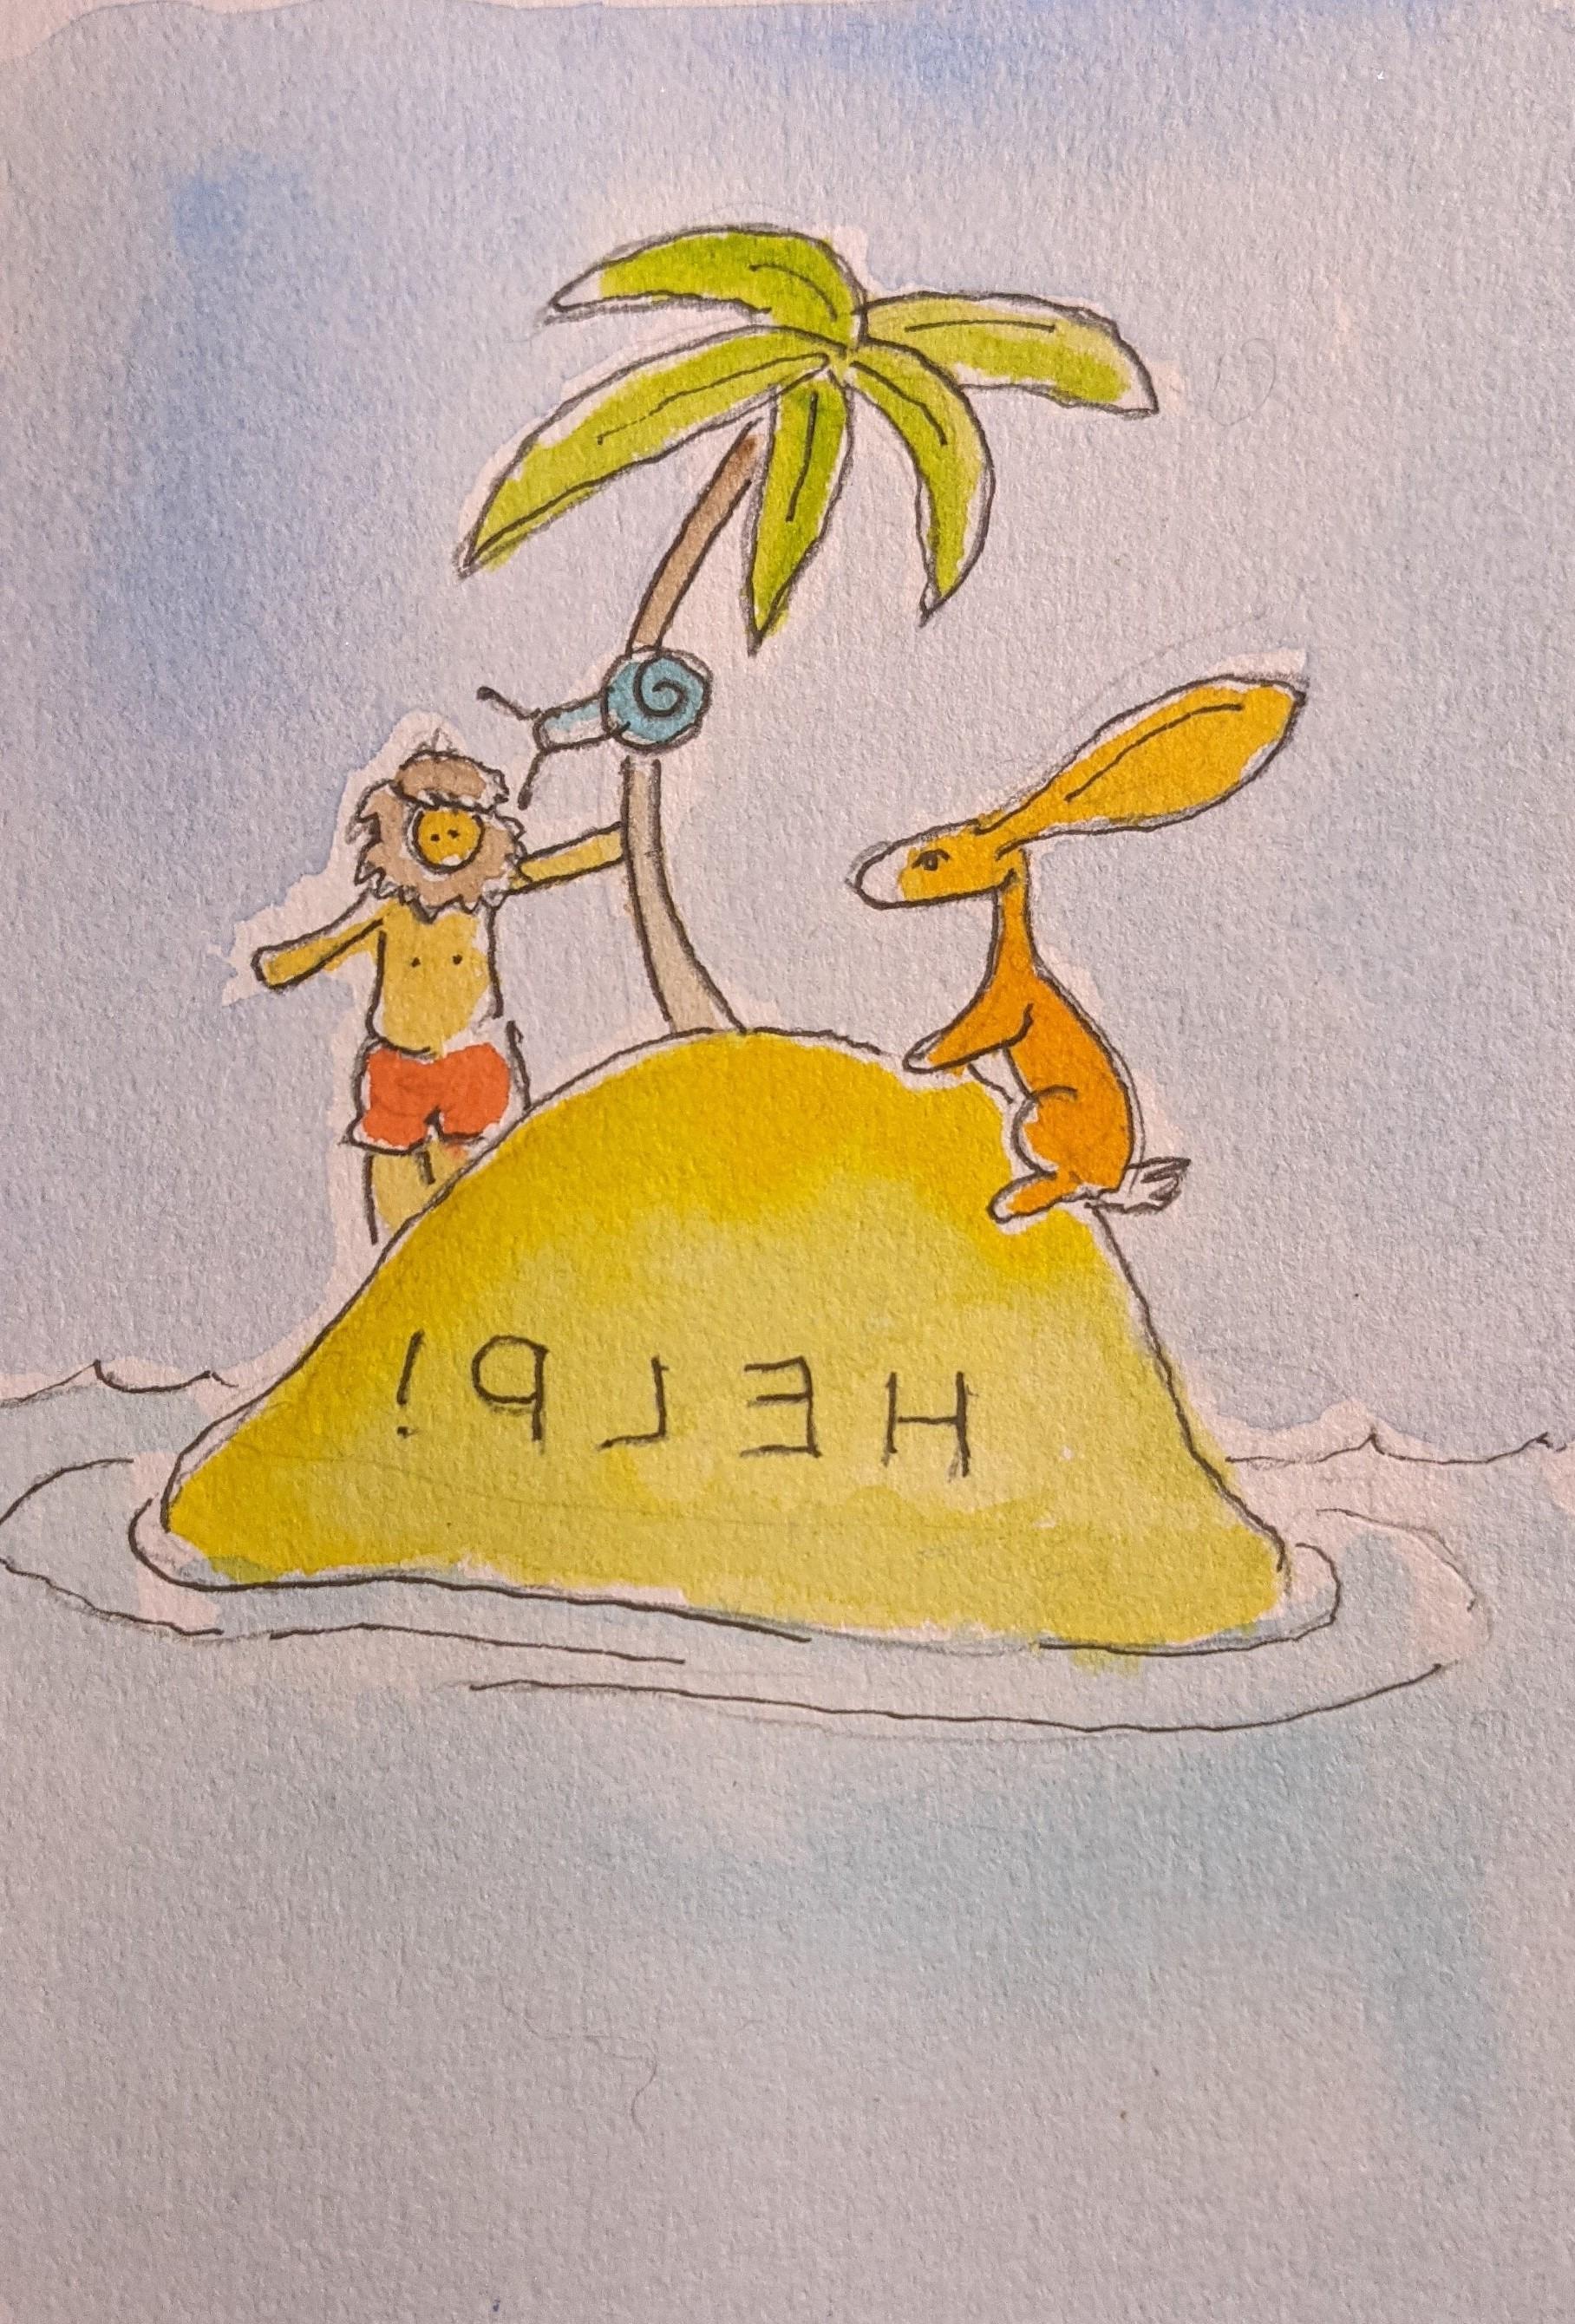 Day13 Robinson Crusoe